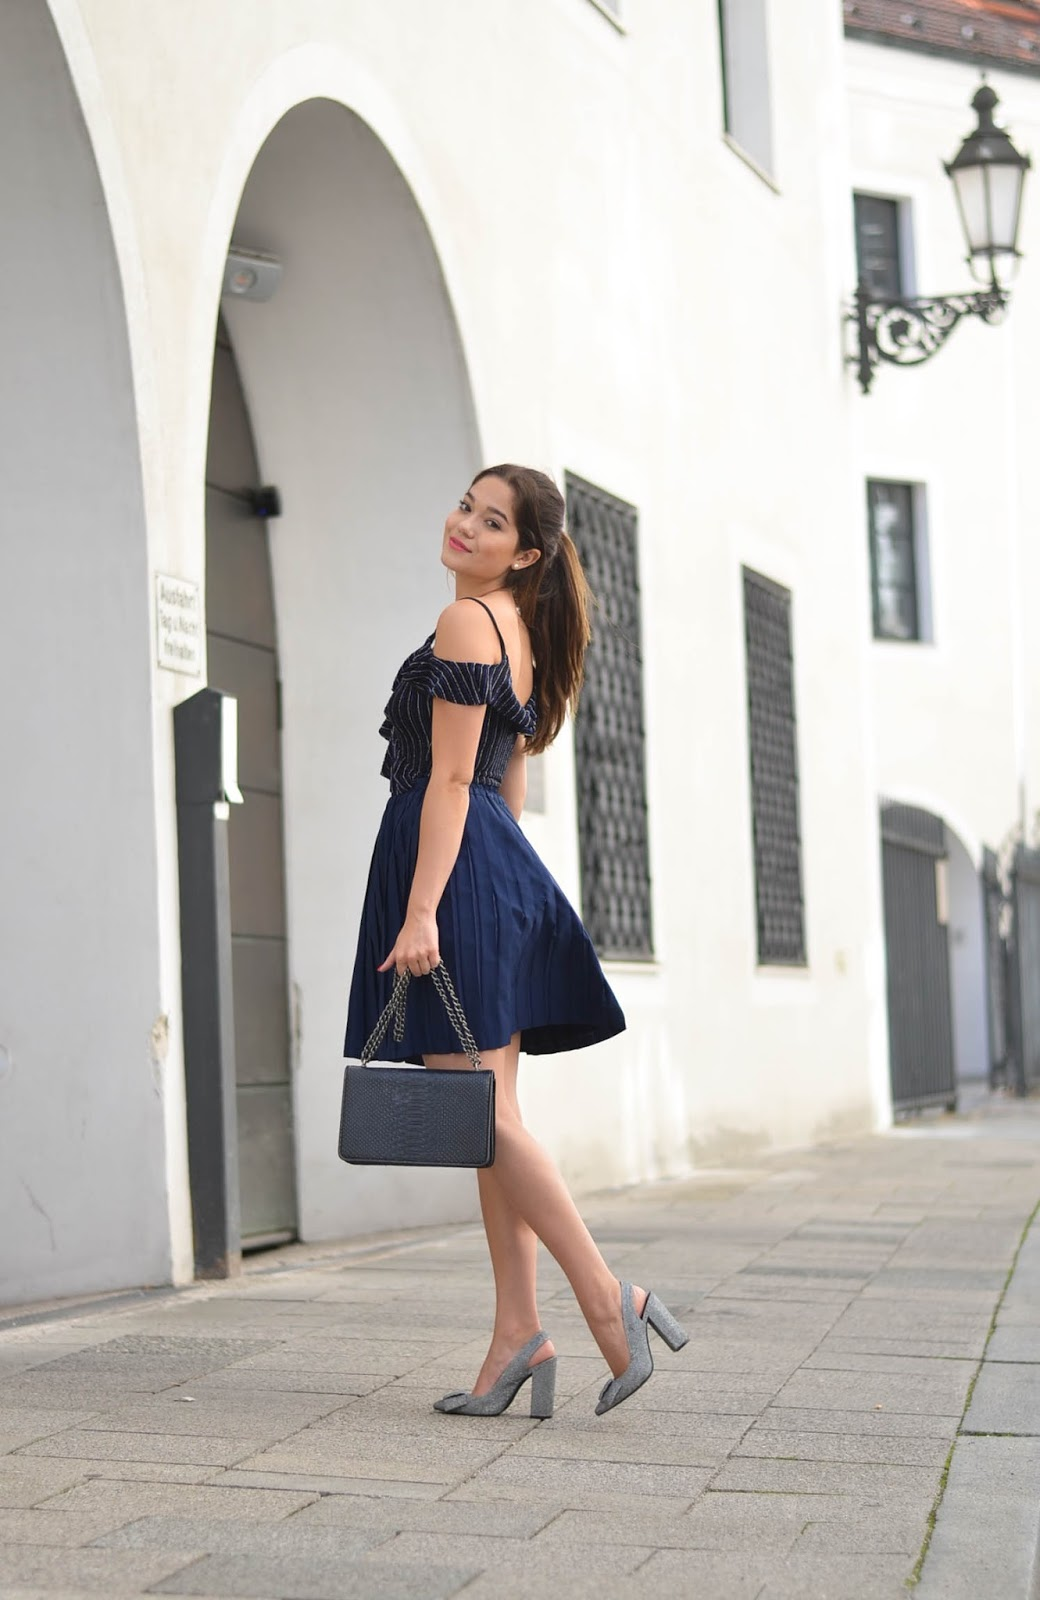 ccbf98f9650 Selin Mina - Modeblog aus München   Fashionblog from Munich  Fall ...